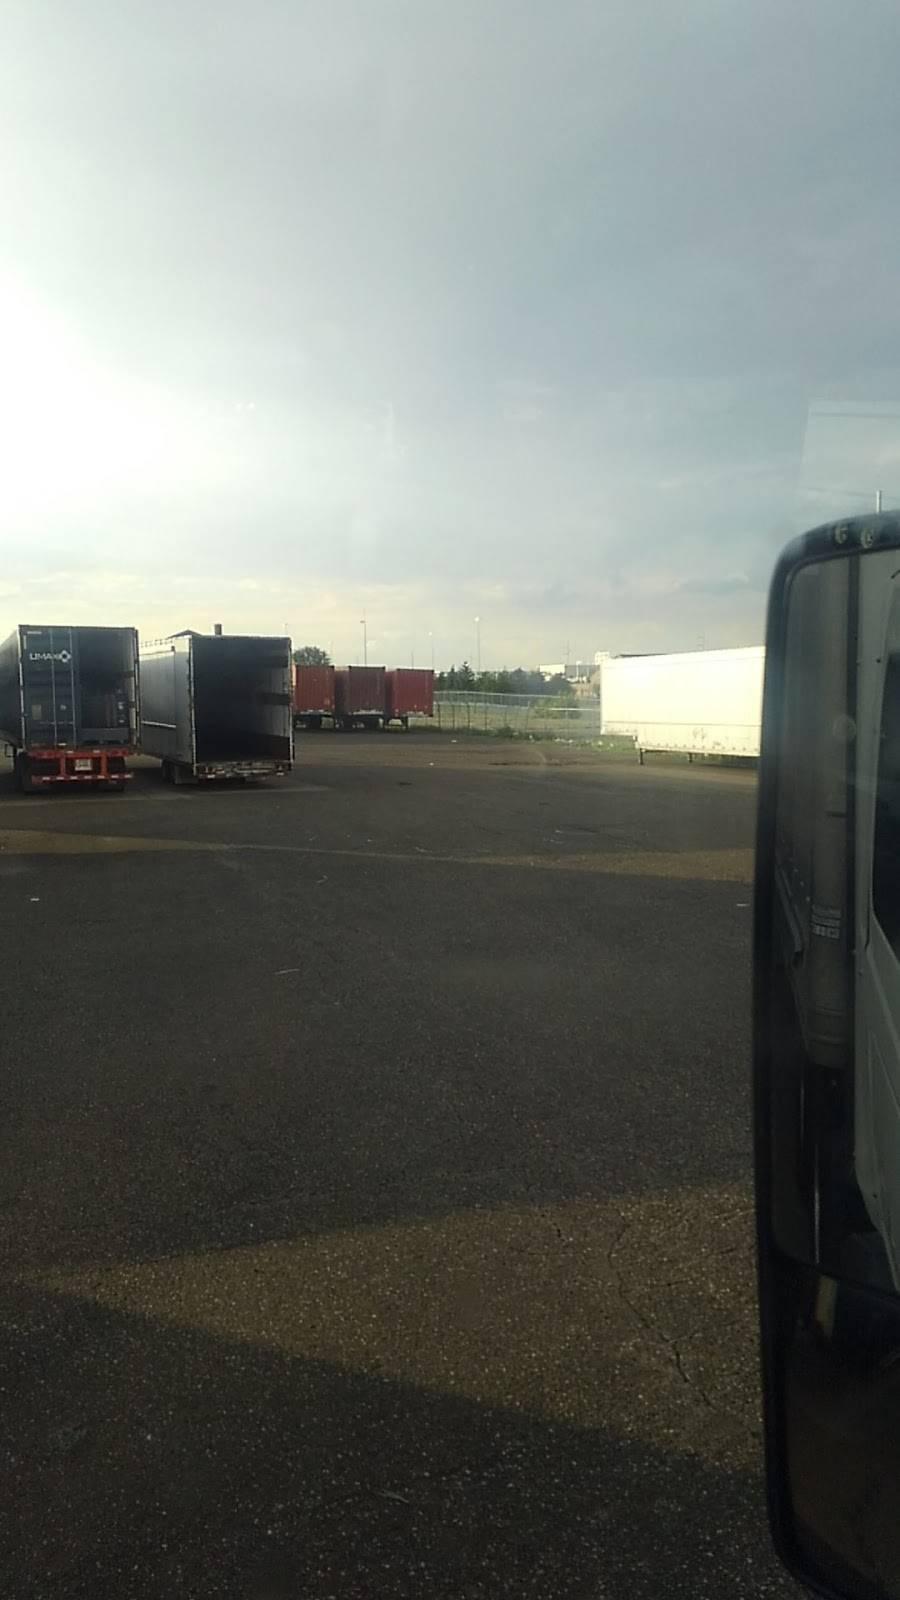 KACE Logistics - car repair  | Photo 3 of 10 | Address: 11851 Freud St, Detroit, MI 48214, USA | Phone: (313) 499-3088